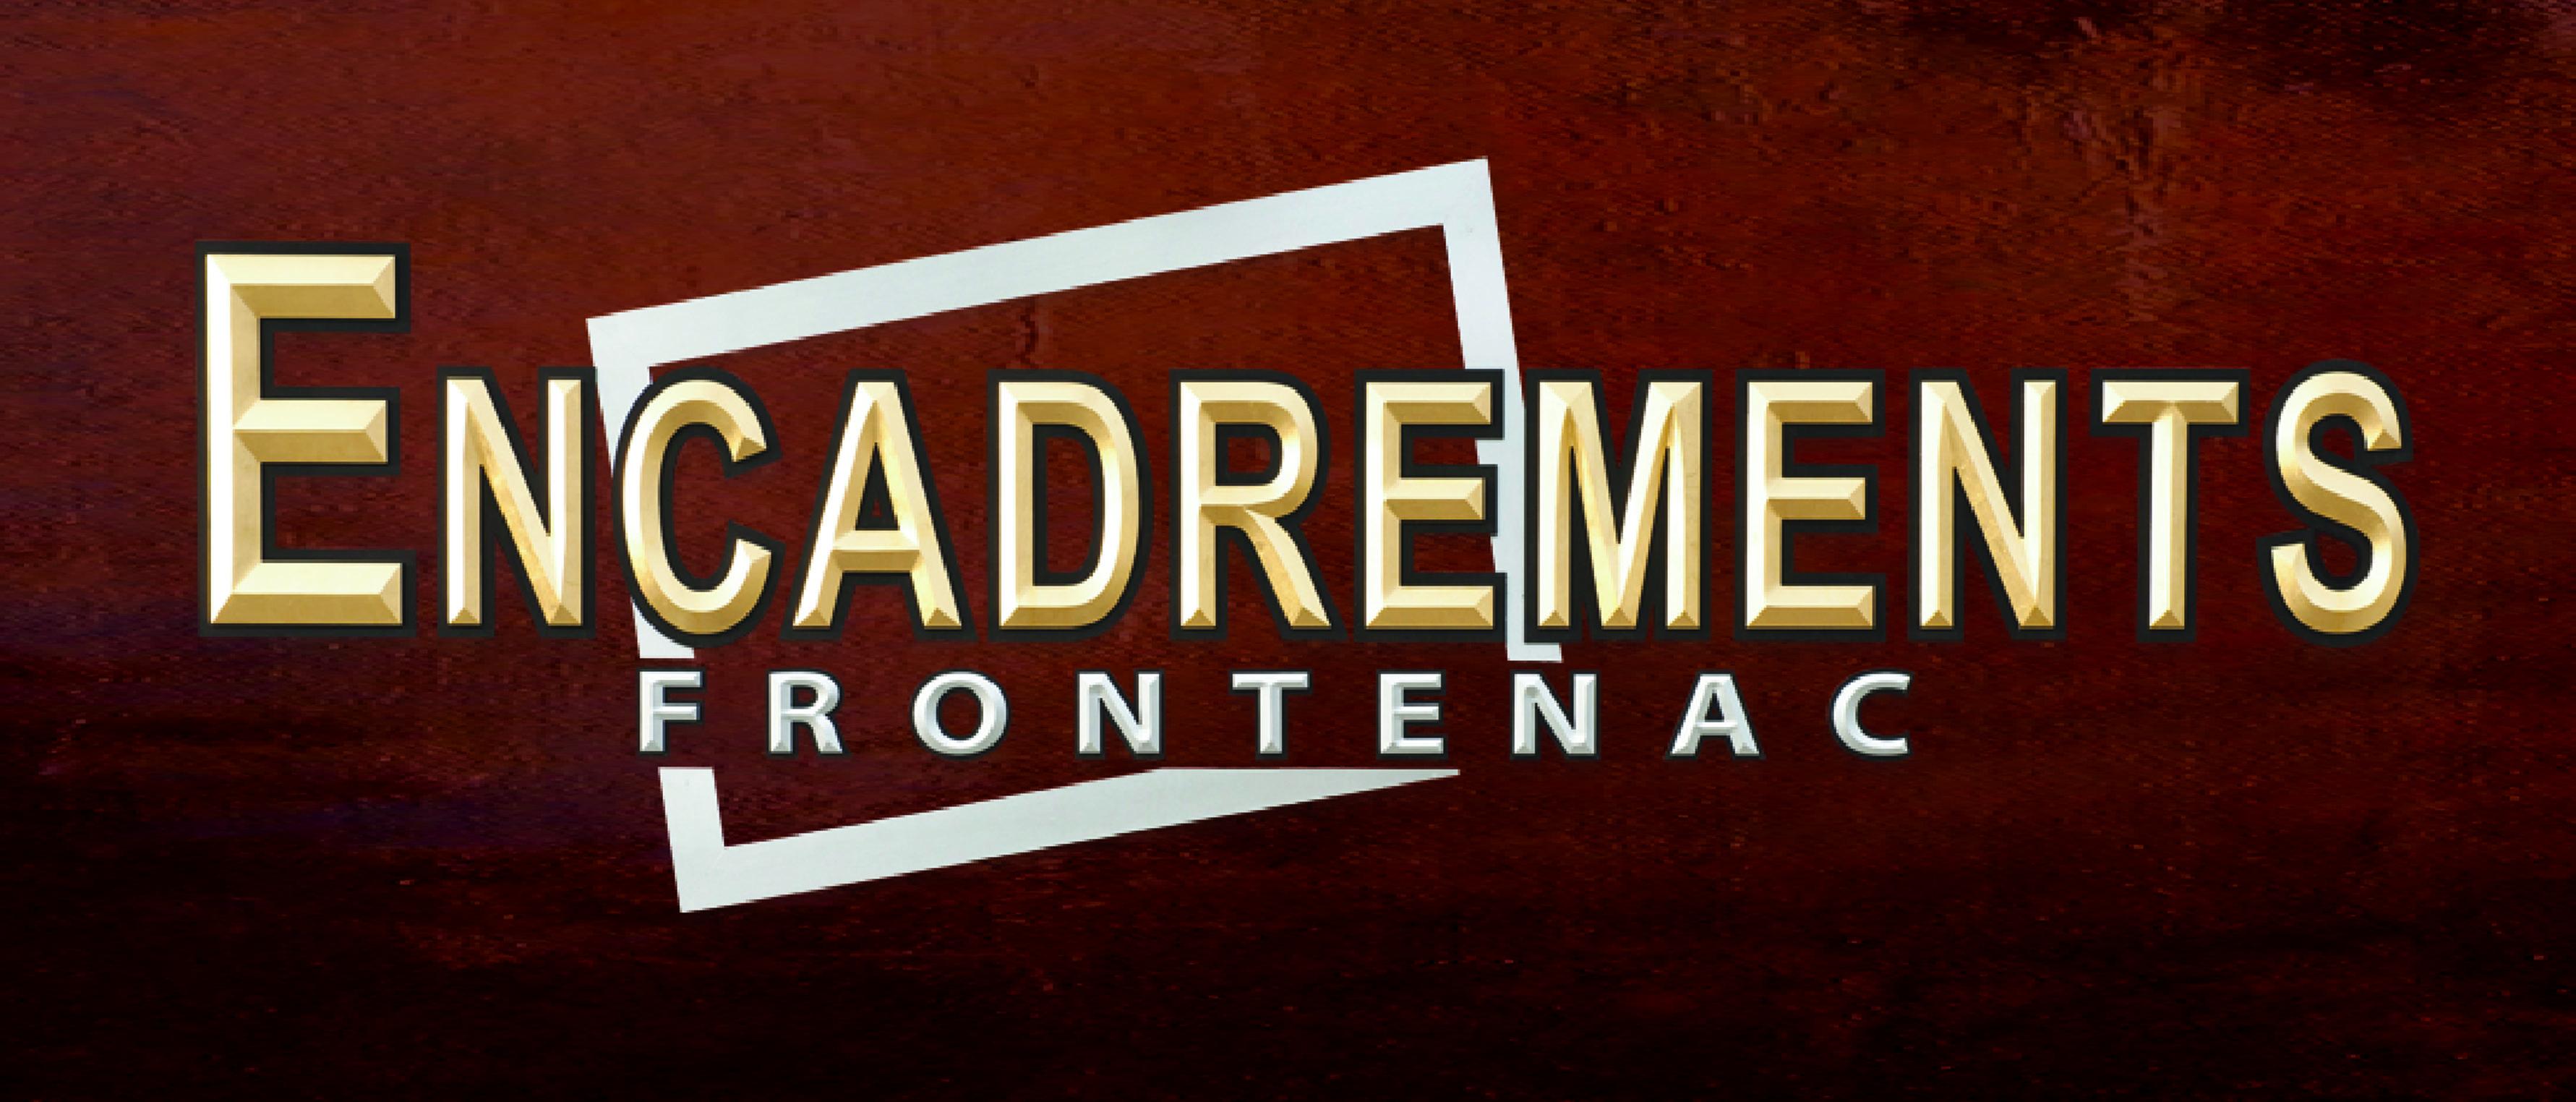 Encadrements Frontenac